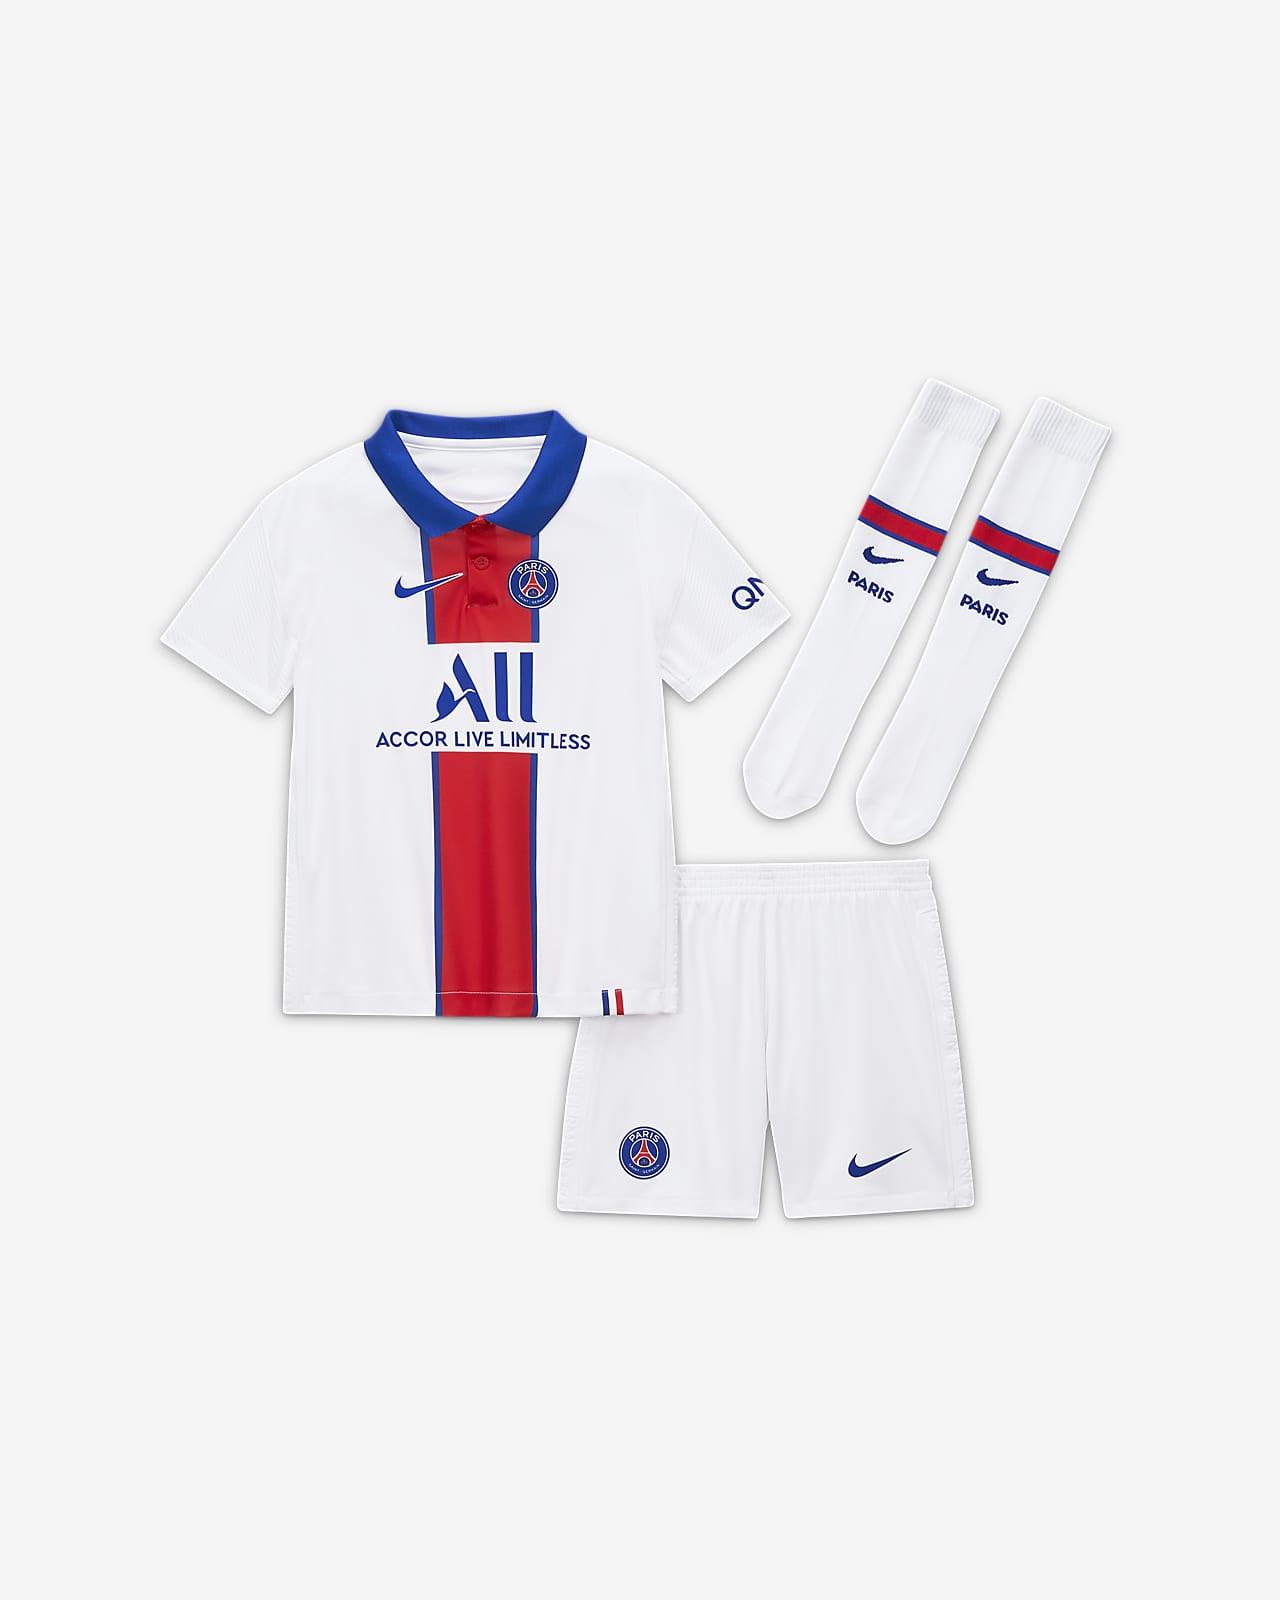 Paris Saint-Germain 2020/21 Away Fußballtrikot-Set für jüngere Kinder